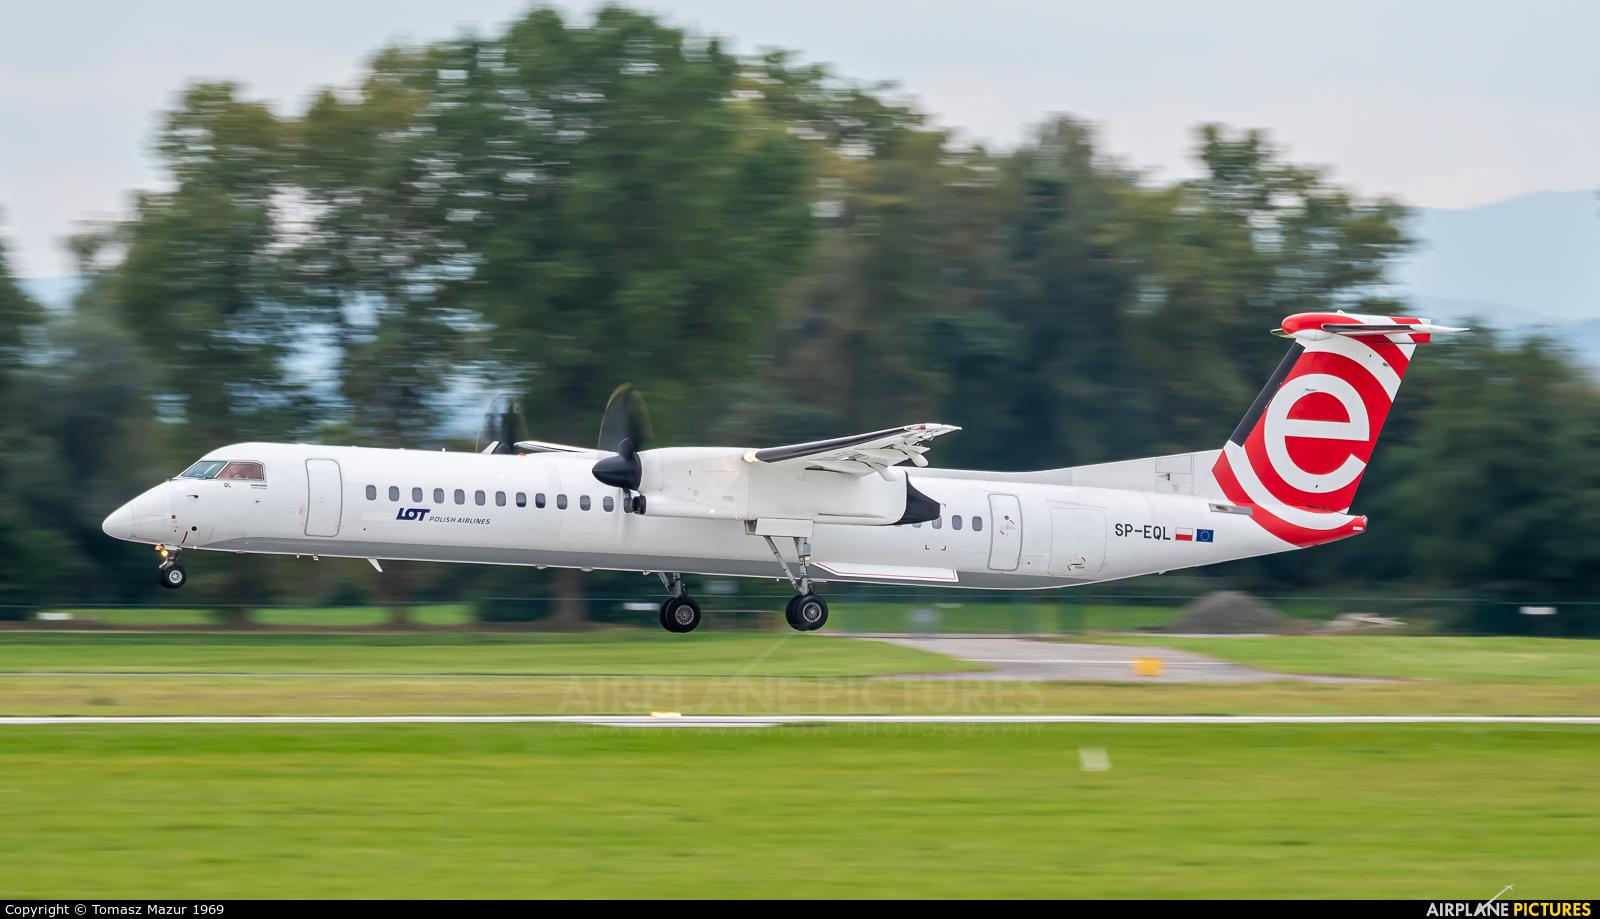 LOT - Polish Airlines SP-EQL aircraft at Kraków - John Paul II Intl